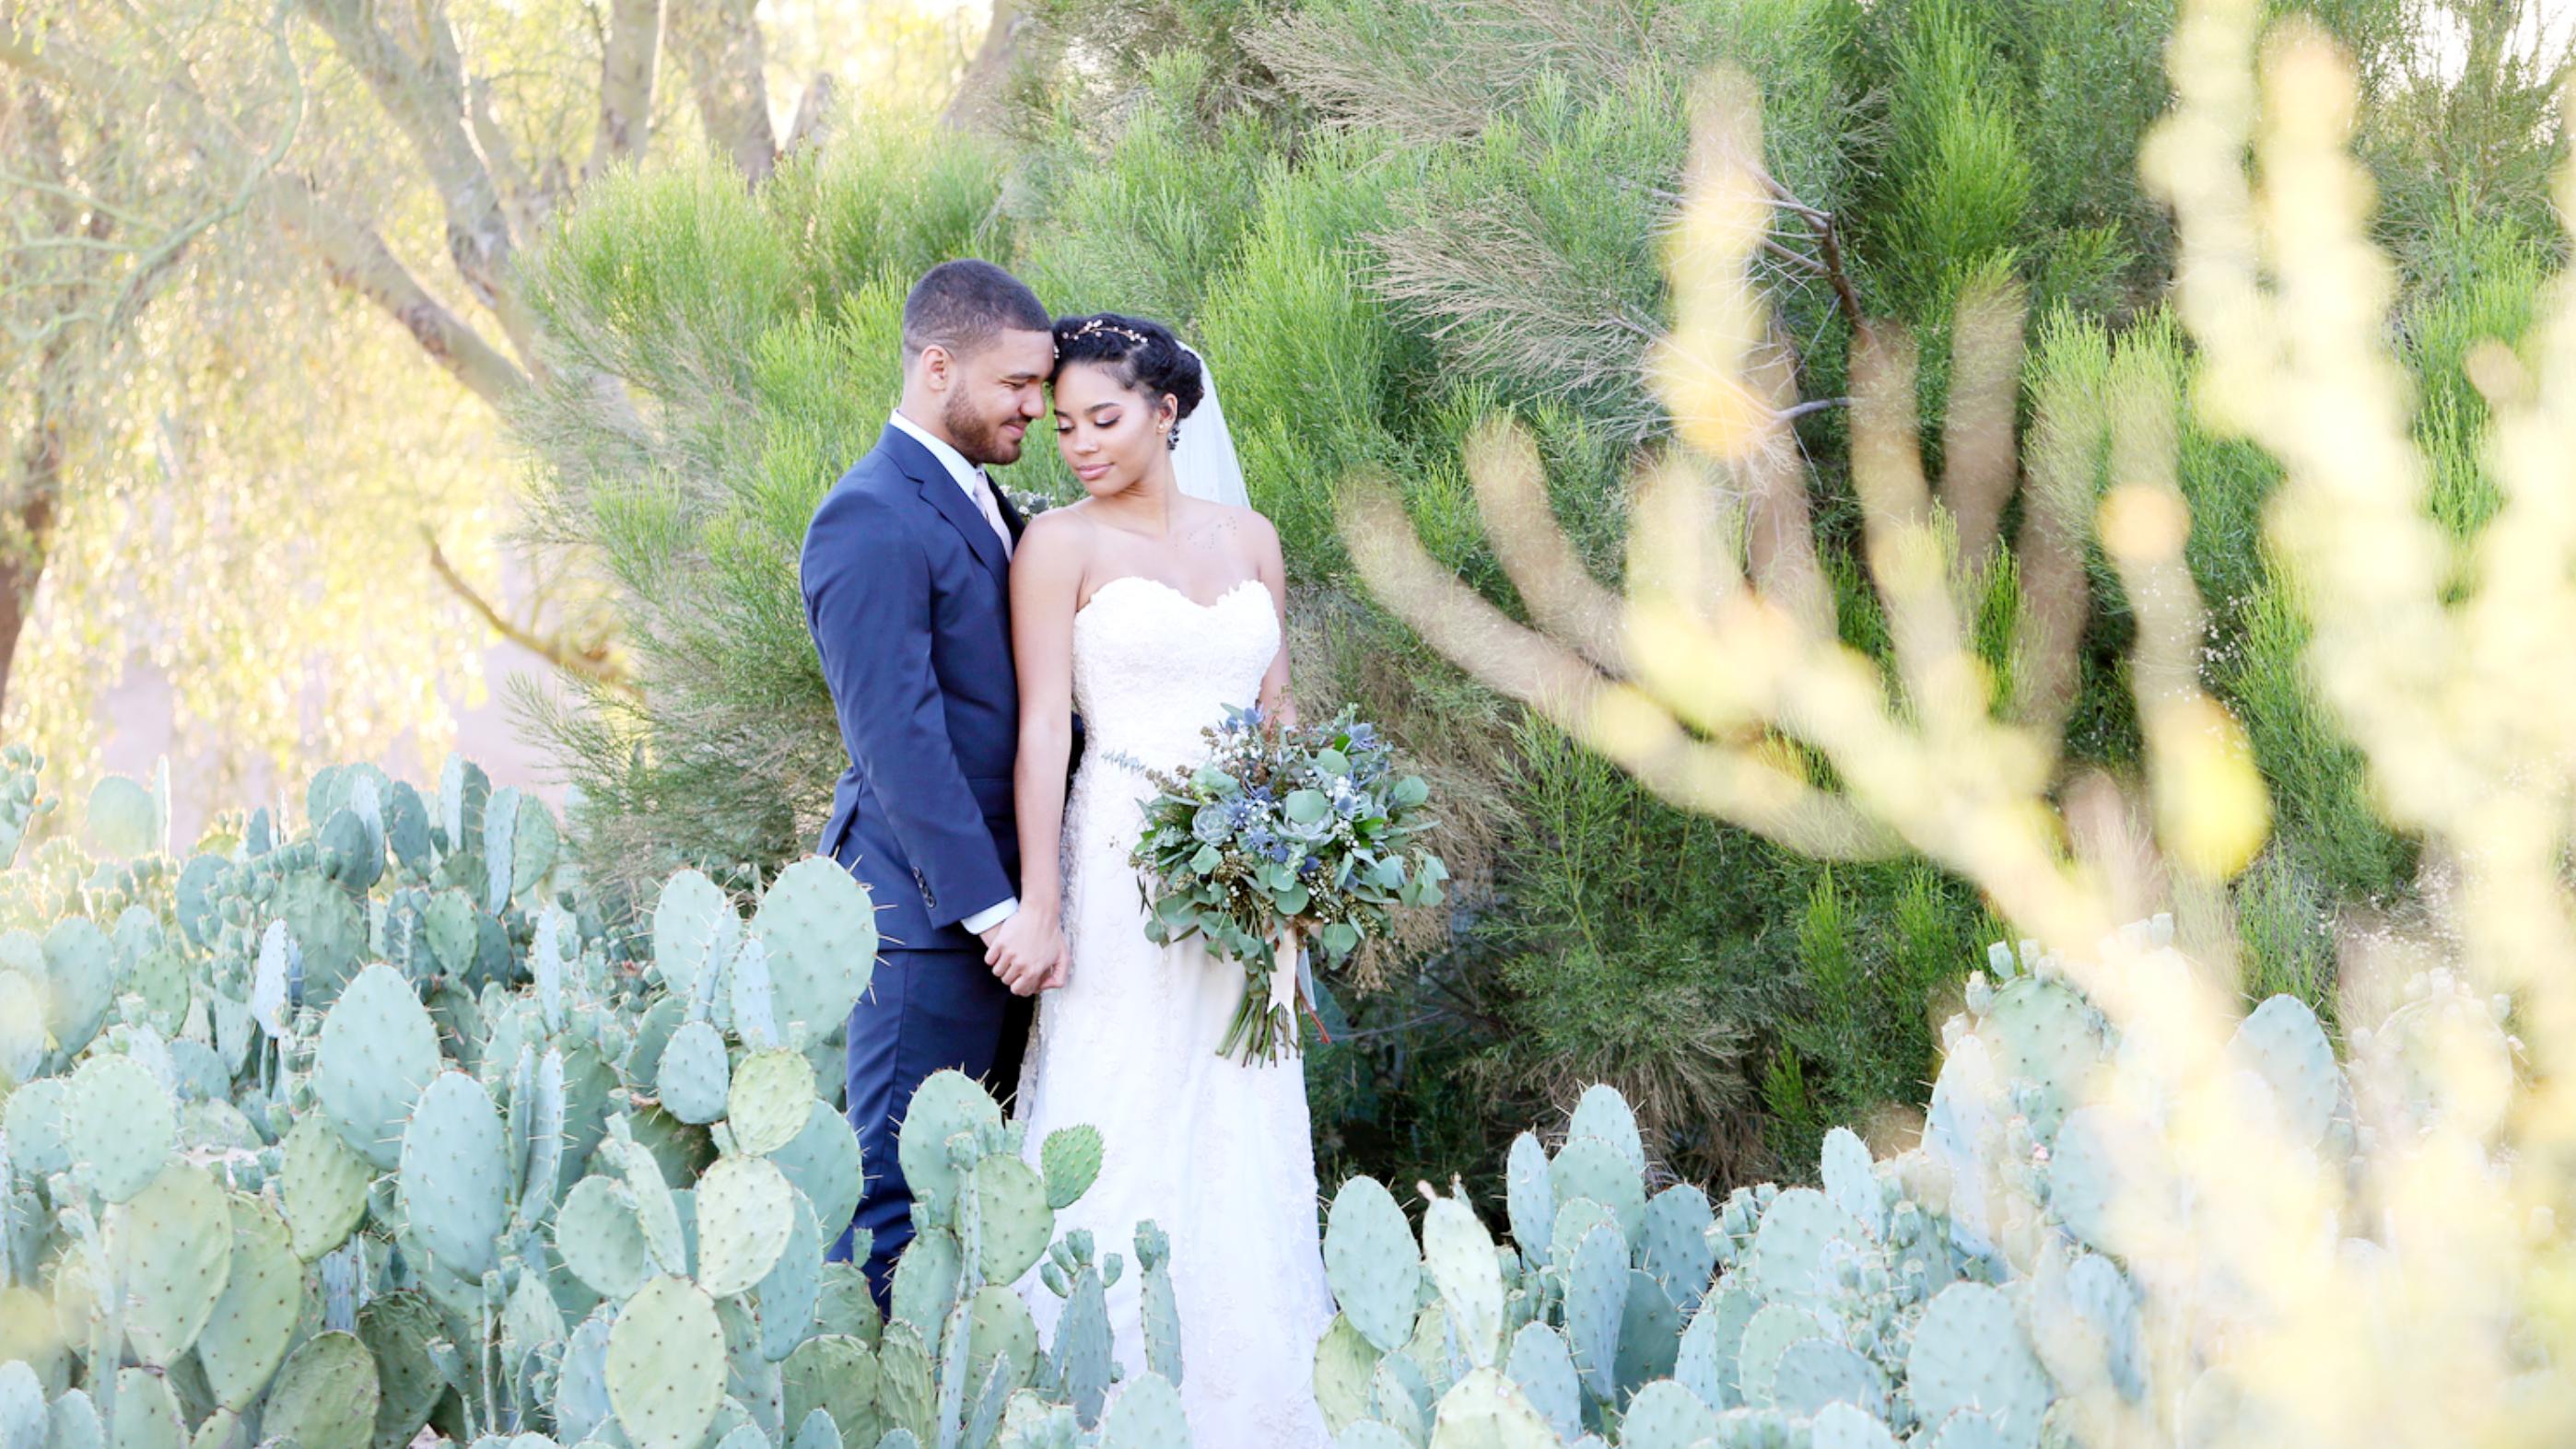 Bride & Groom | Cactus Garden | Memories by Karen | Palm Valley by Wedgewood Weddings